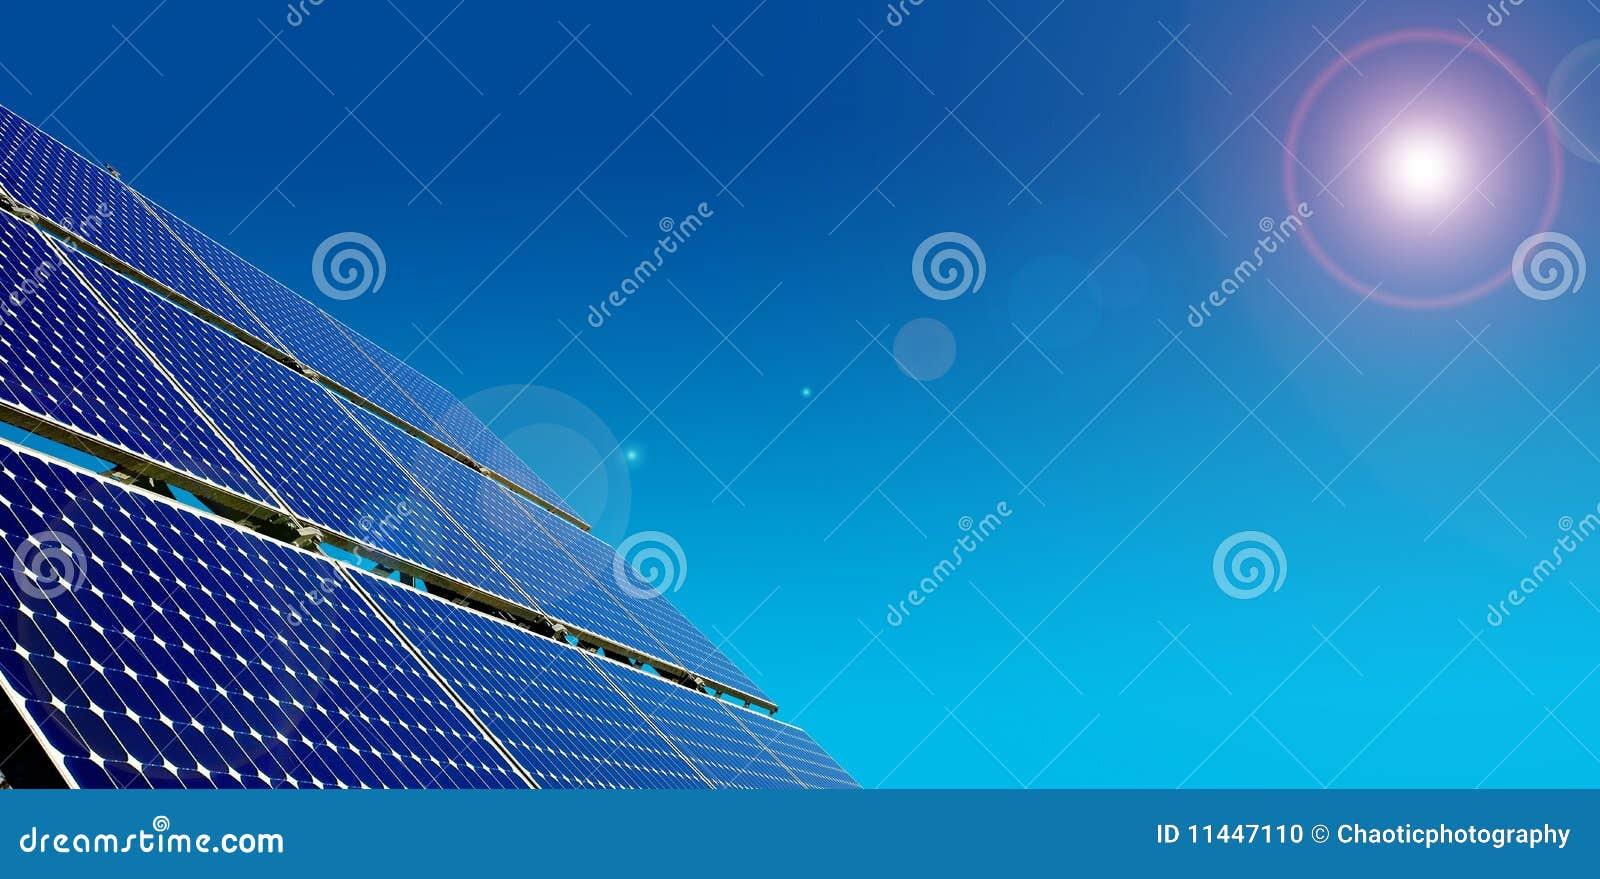 mr: no pr: no 2 401 4 solarpanel id 11447110 ©